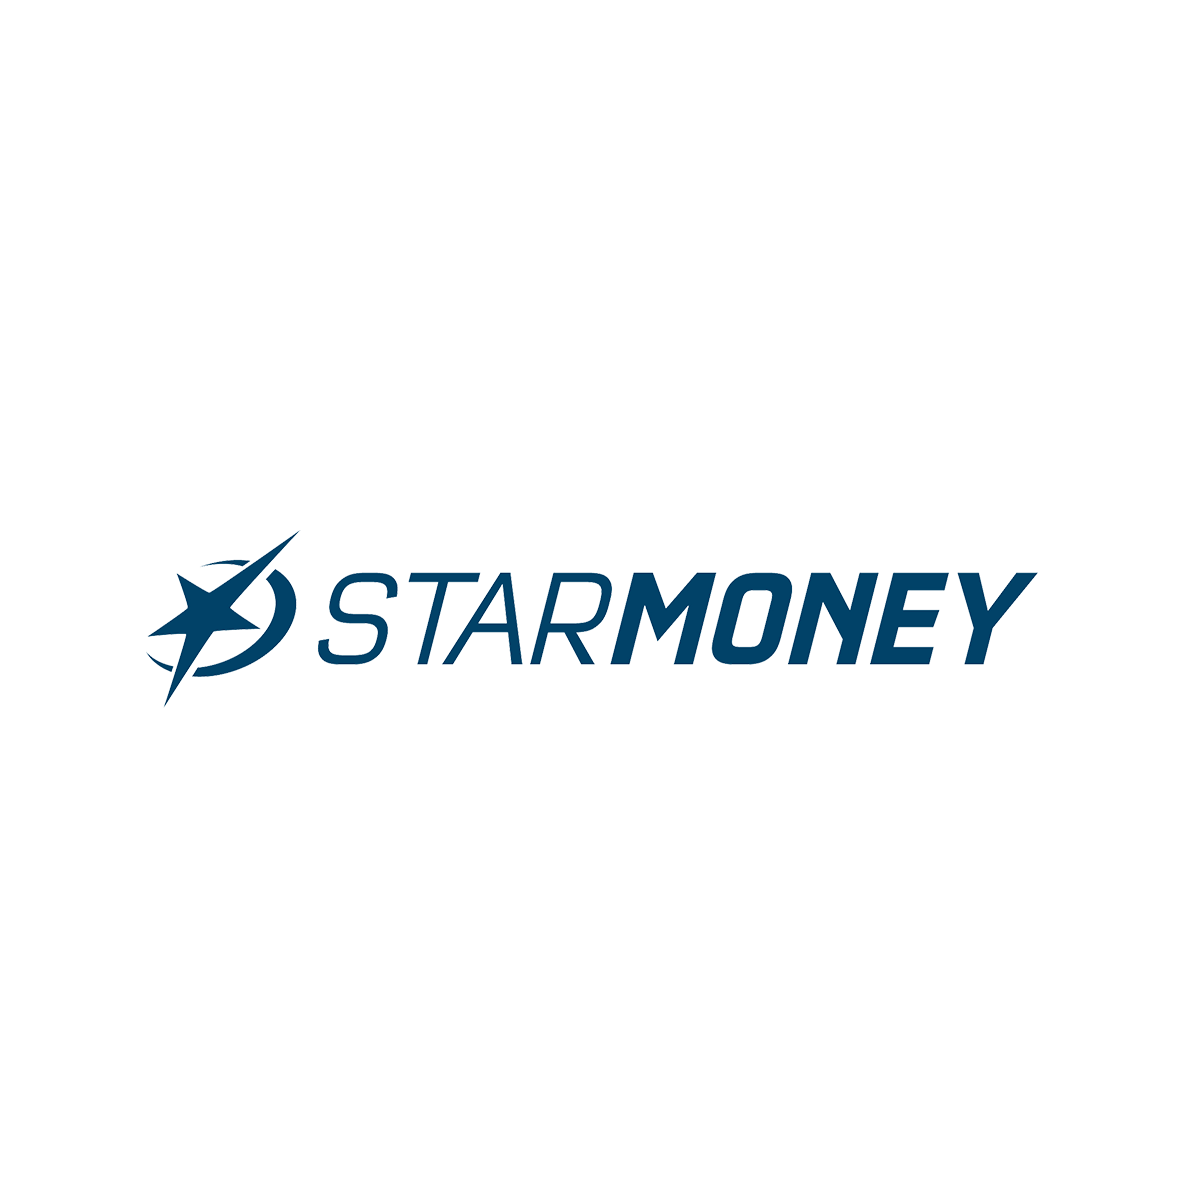 starmoney kachel - Schnittstellen